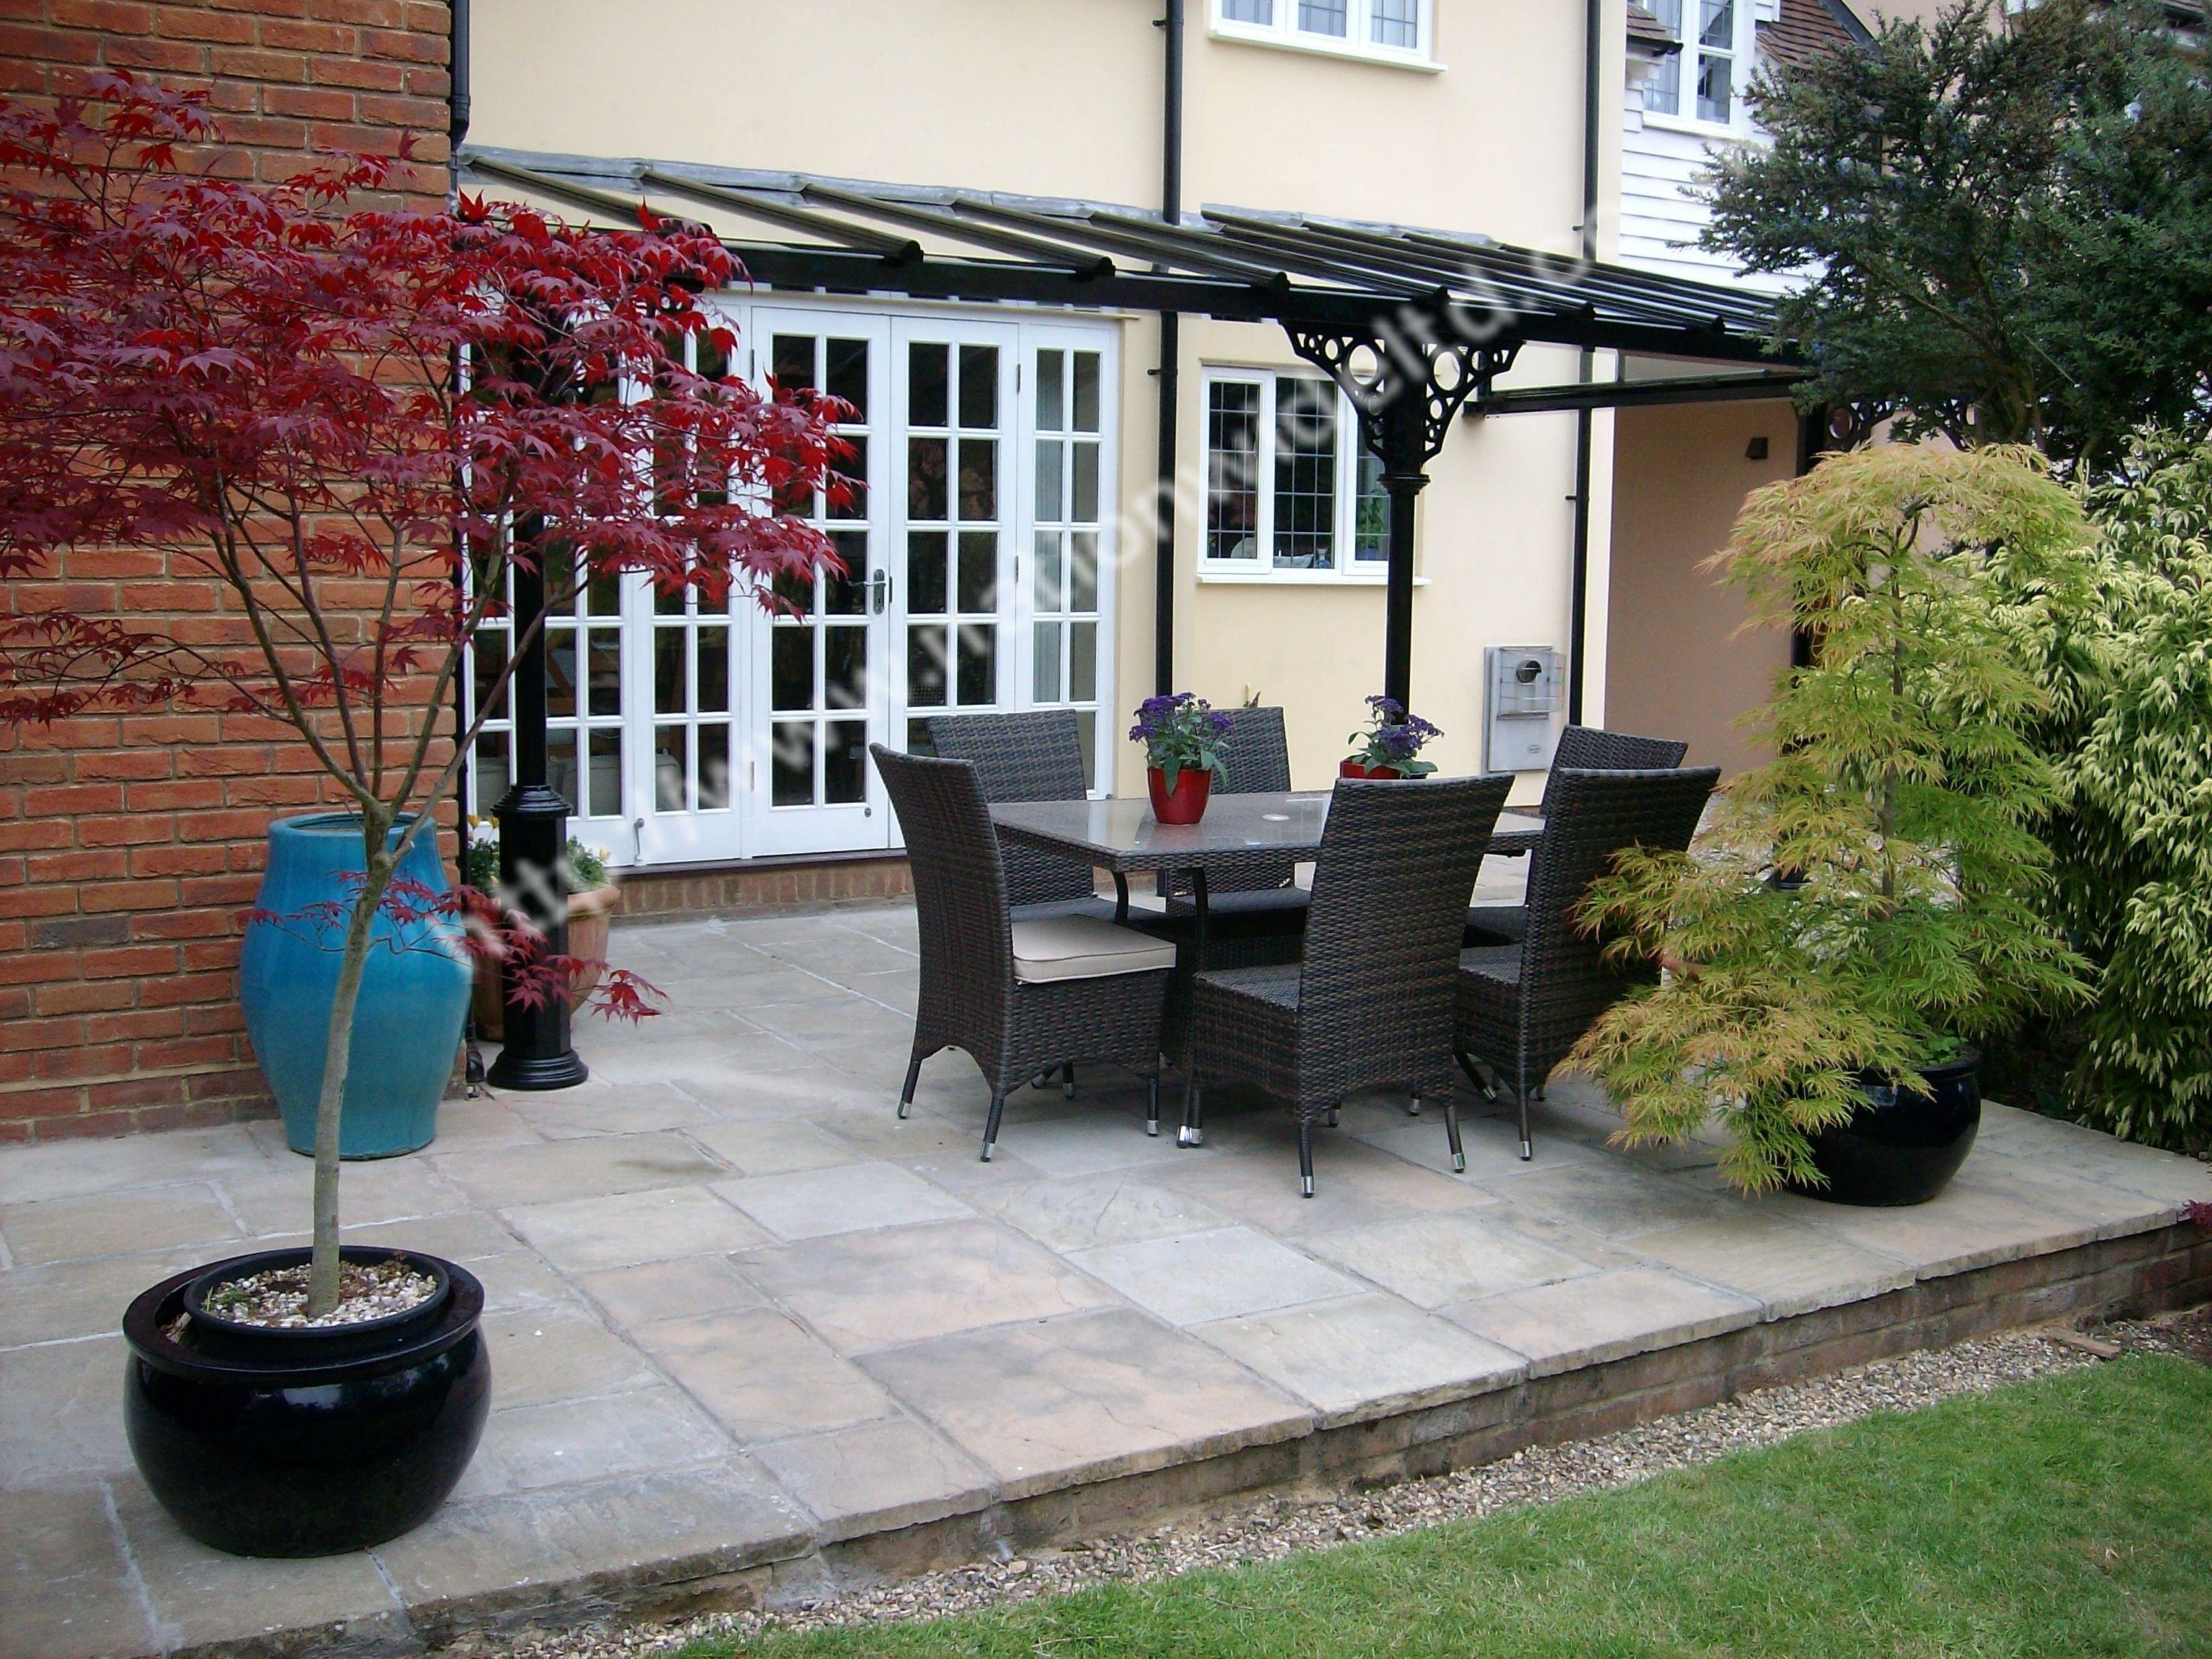 Glass roof garden verandas veranda pinterest glass roof glass roof garden verandas workwithnaturefo